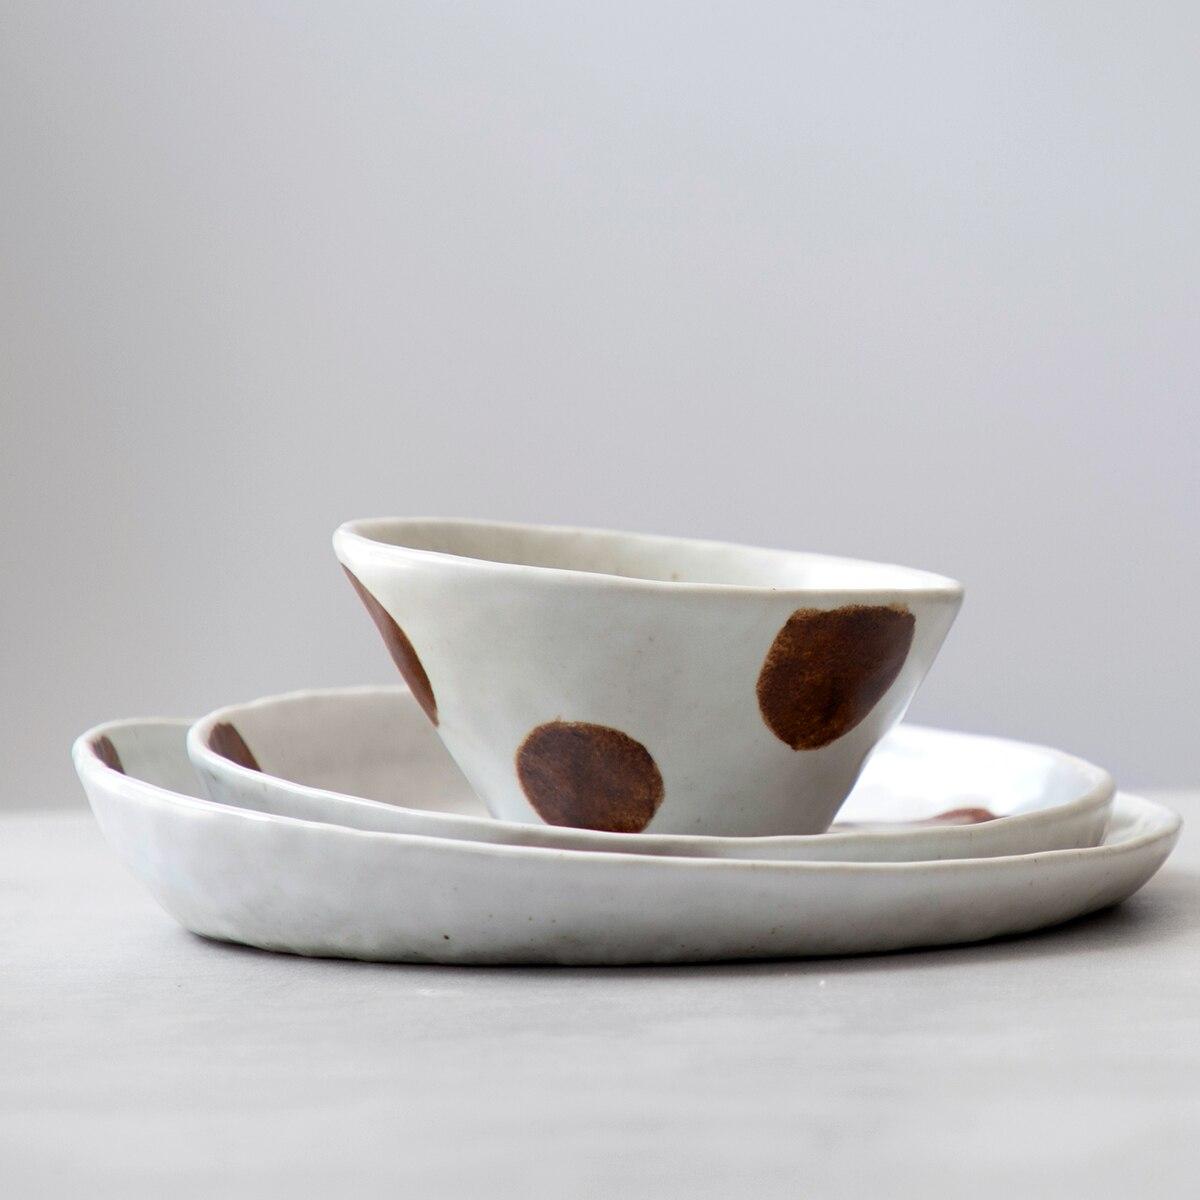 Ceramic Plates Dessert Plate Rice Bowl Dinnerware Set  Dishes And Plates Sets